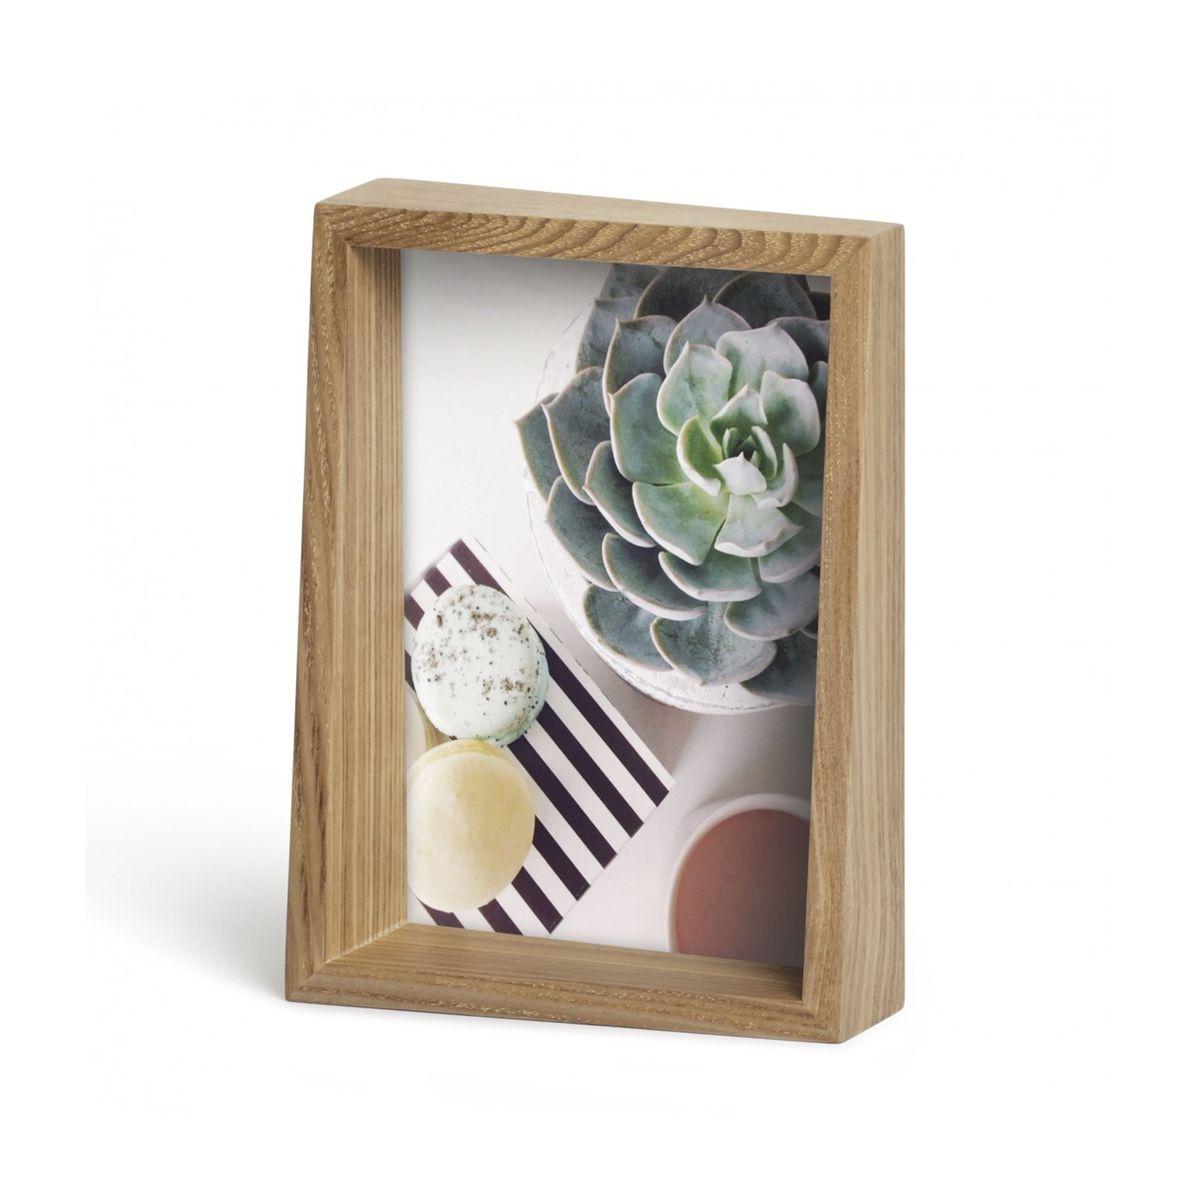 Cadre Edge Frêne Naturel pour Photo 13 x 18 cm Umbra